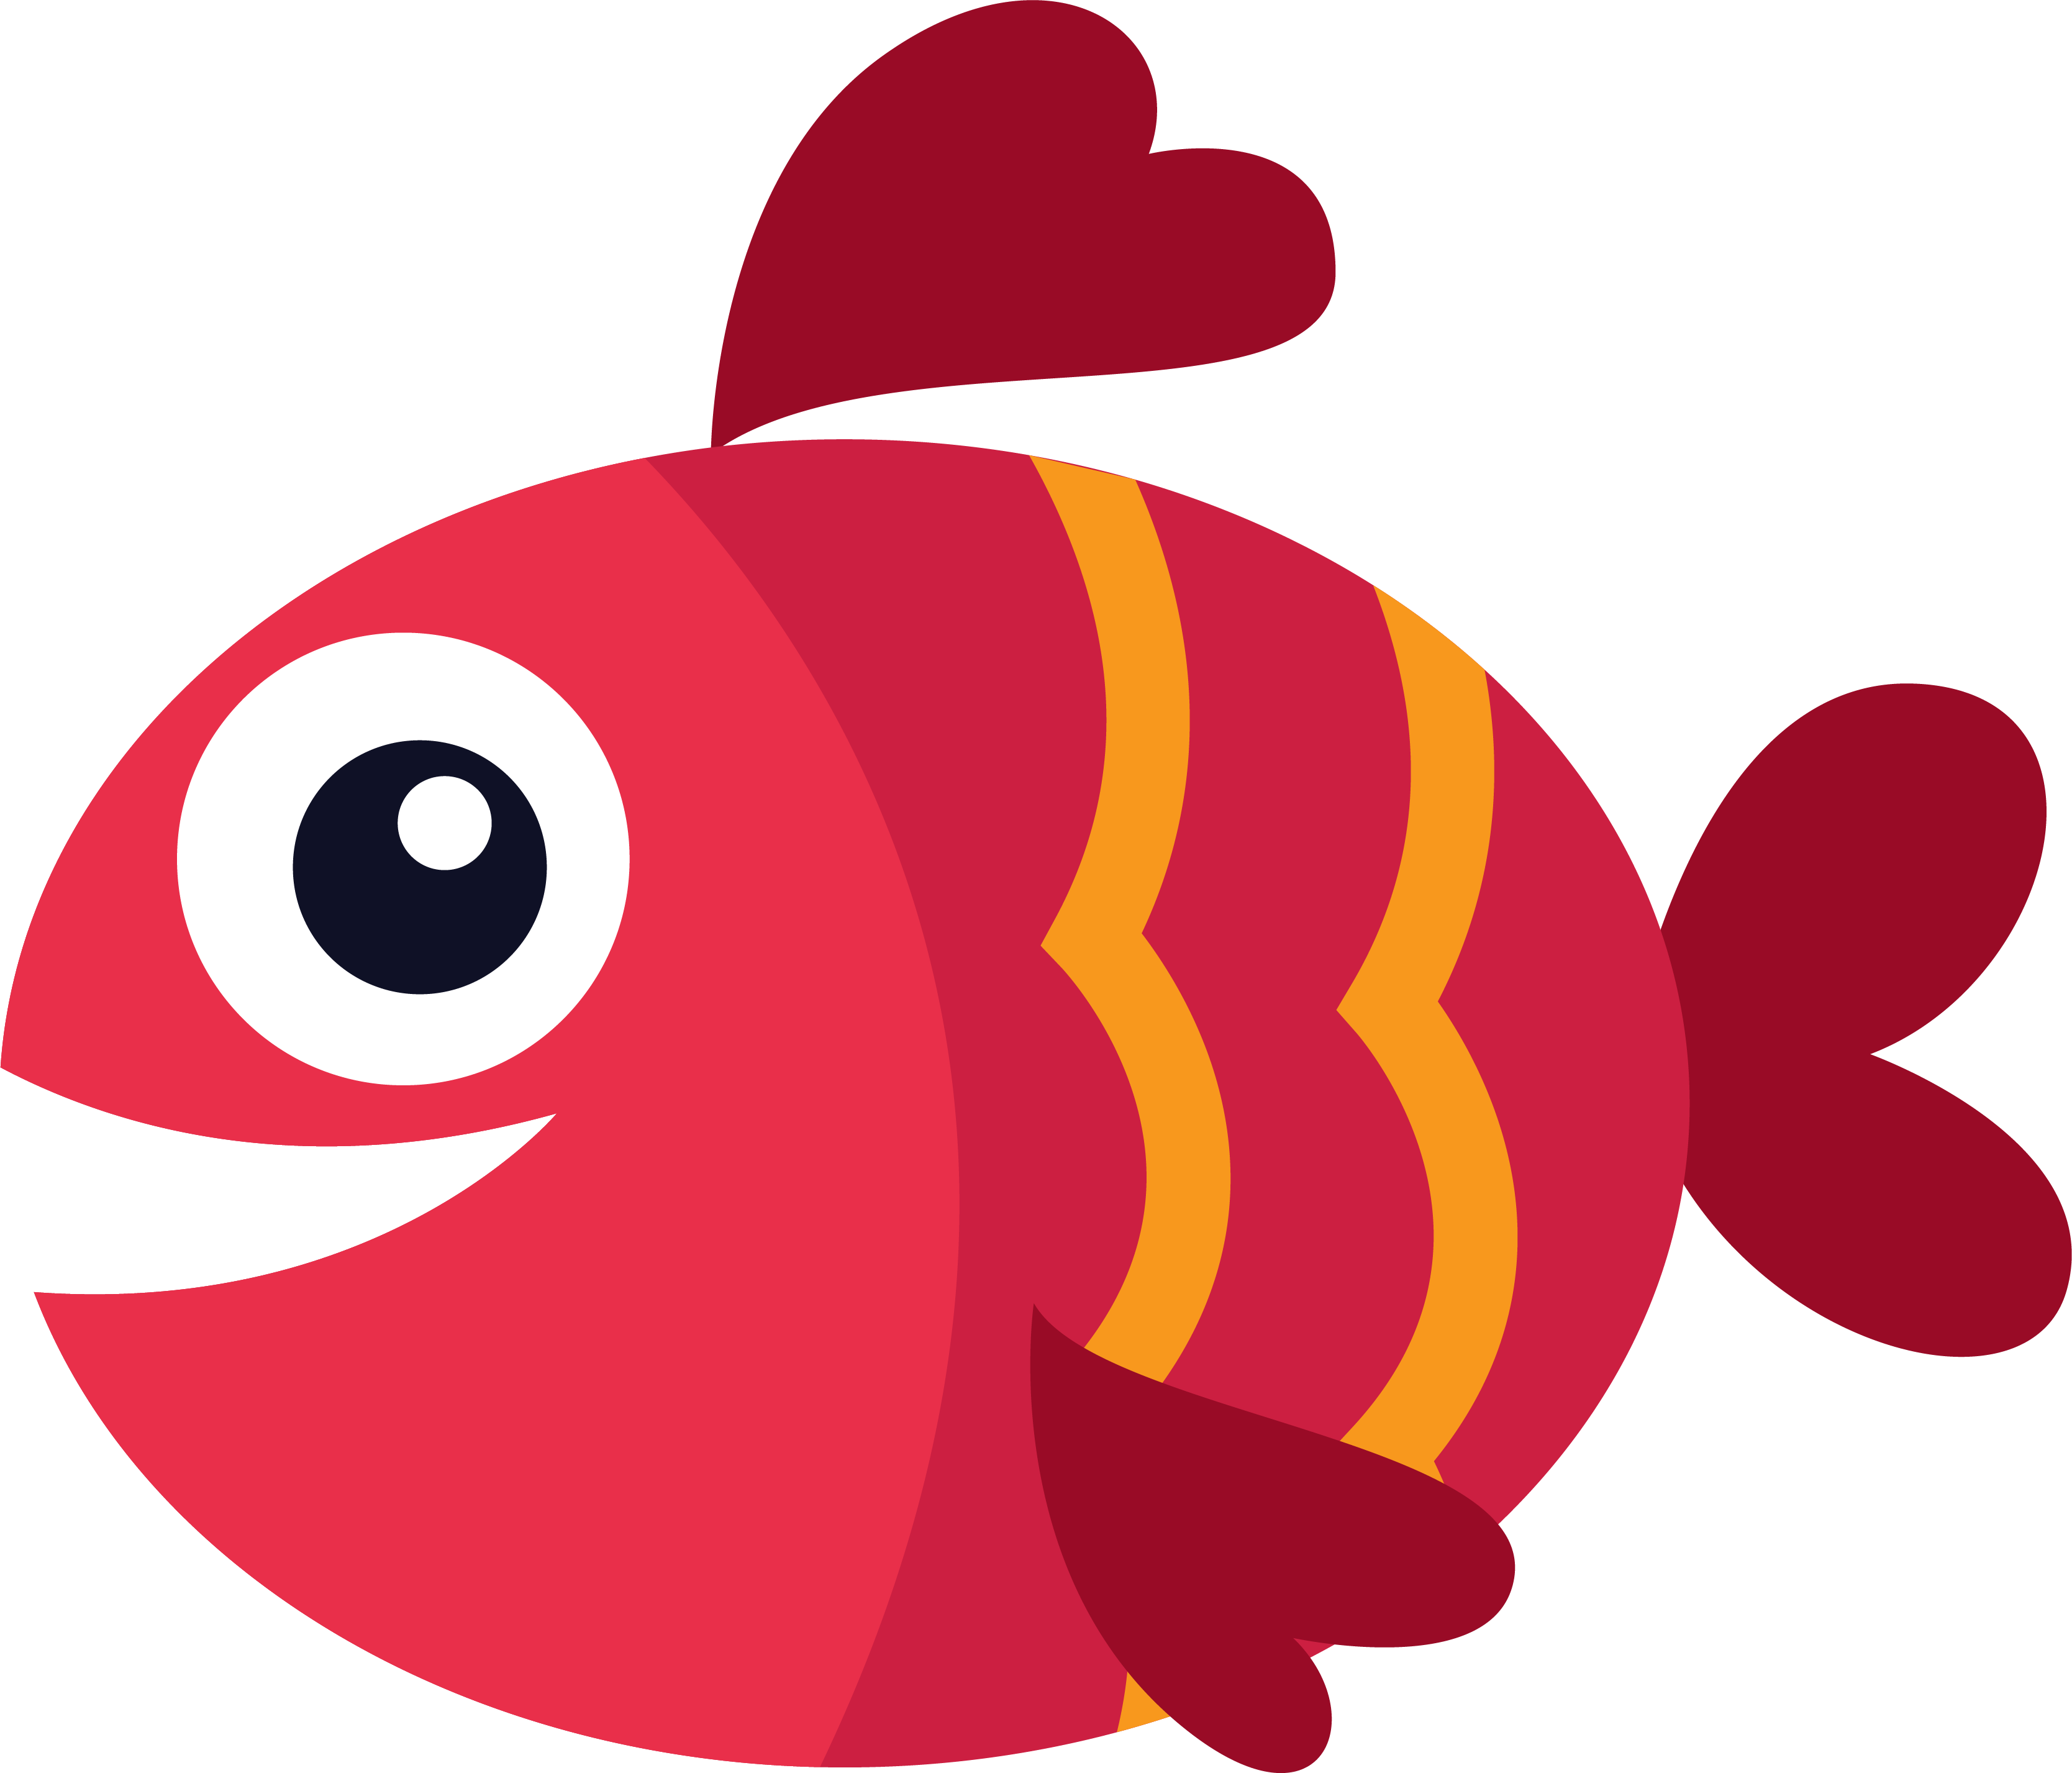 free printable fish clipart at getdrawings com free for personal rh getdrawings com cute fish clipart cute fish clipart black and white